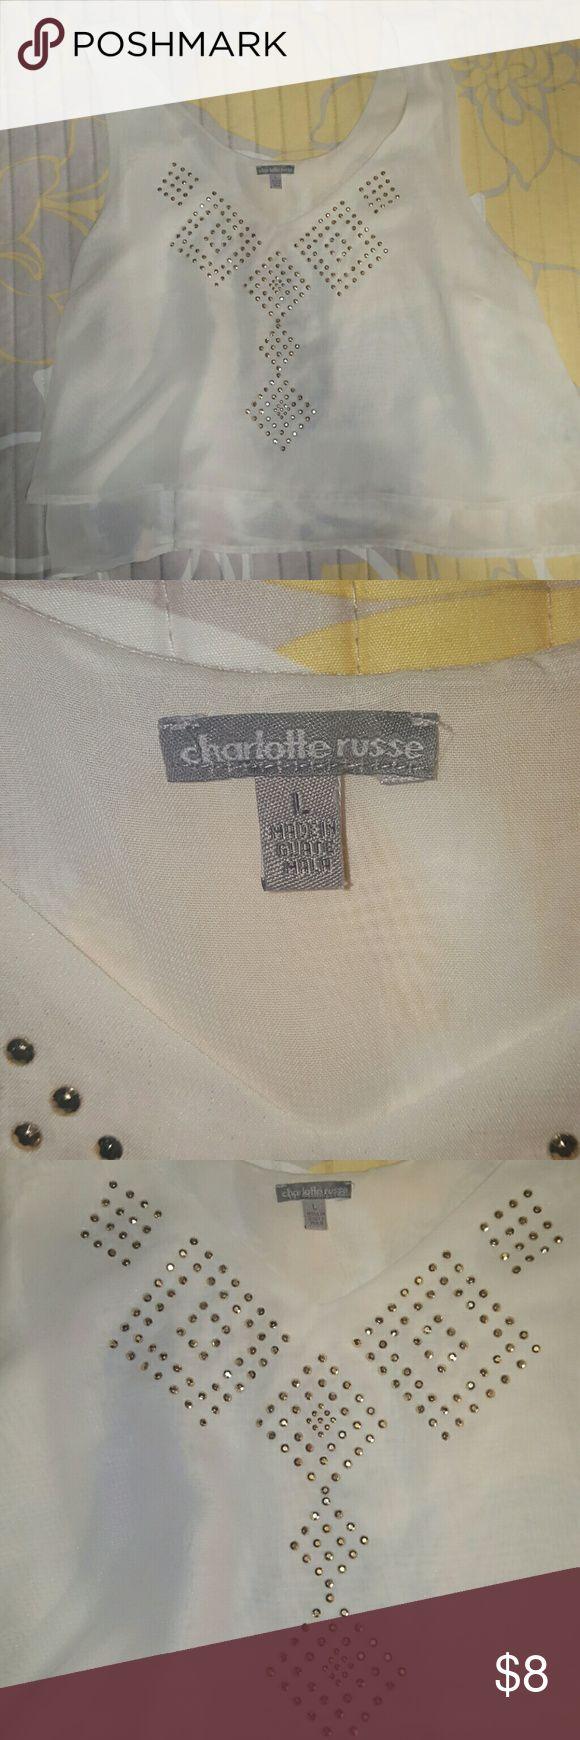 Crop top by Charlotte Russe Crop top by Charlotte Ruuse Tops Crop Tops